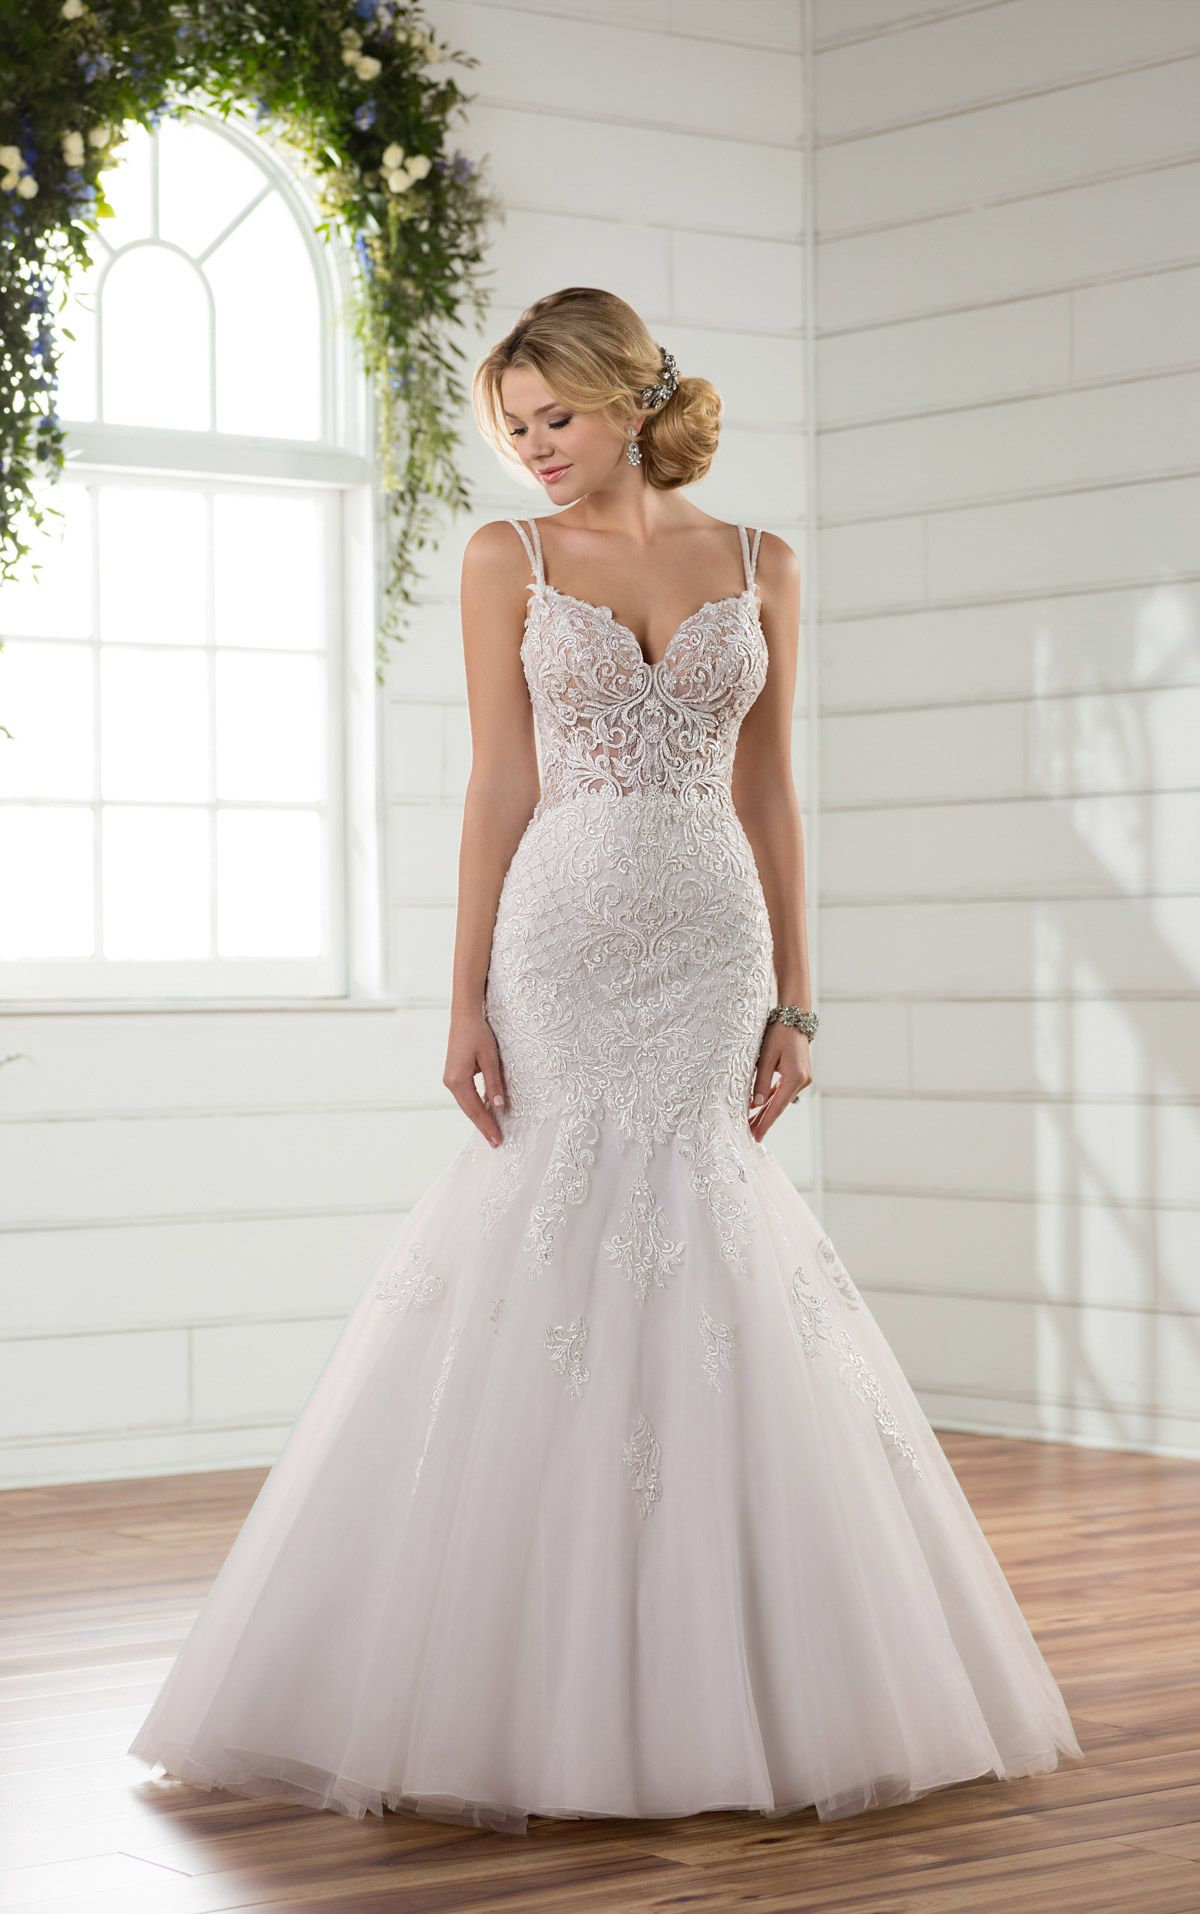 Mermaid Wedding Dresses | French lace, Mermaid wedding dresses and ...